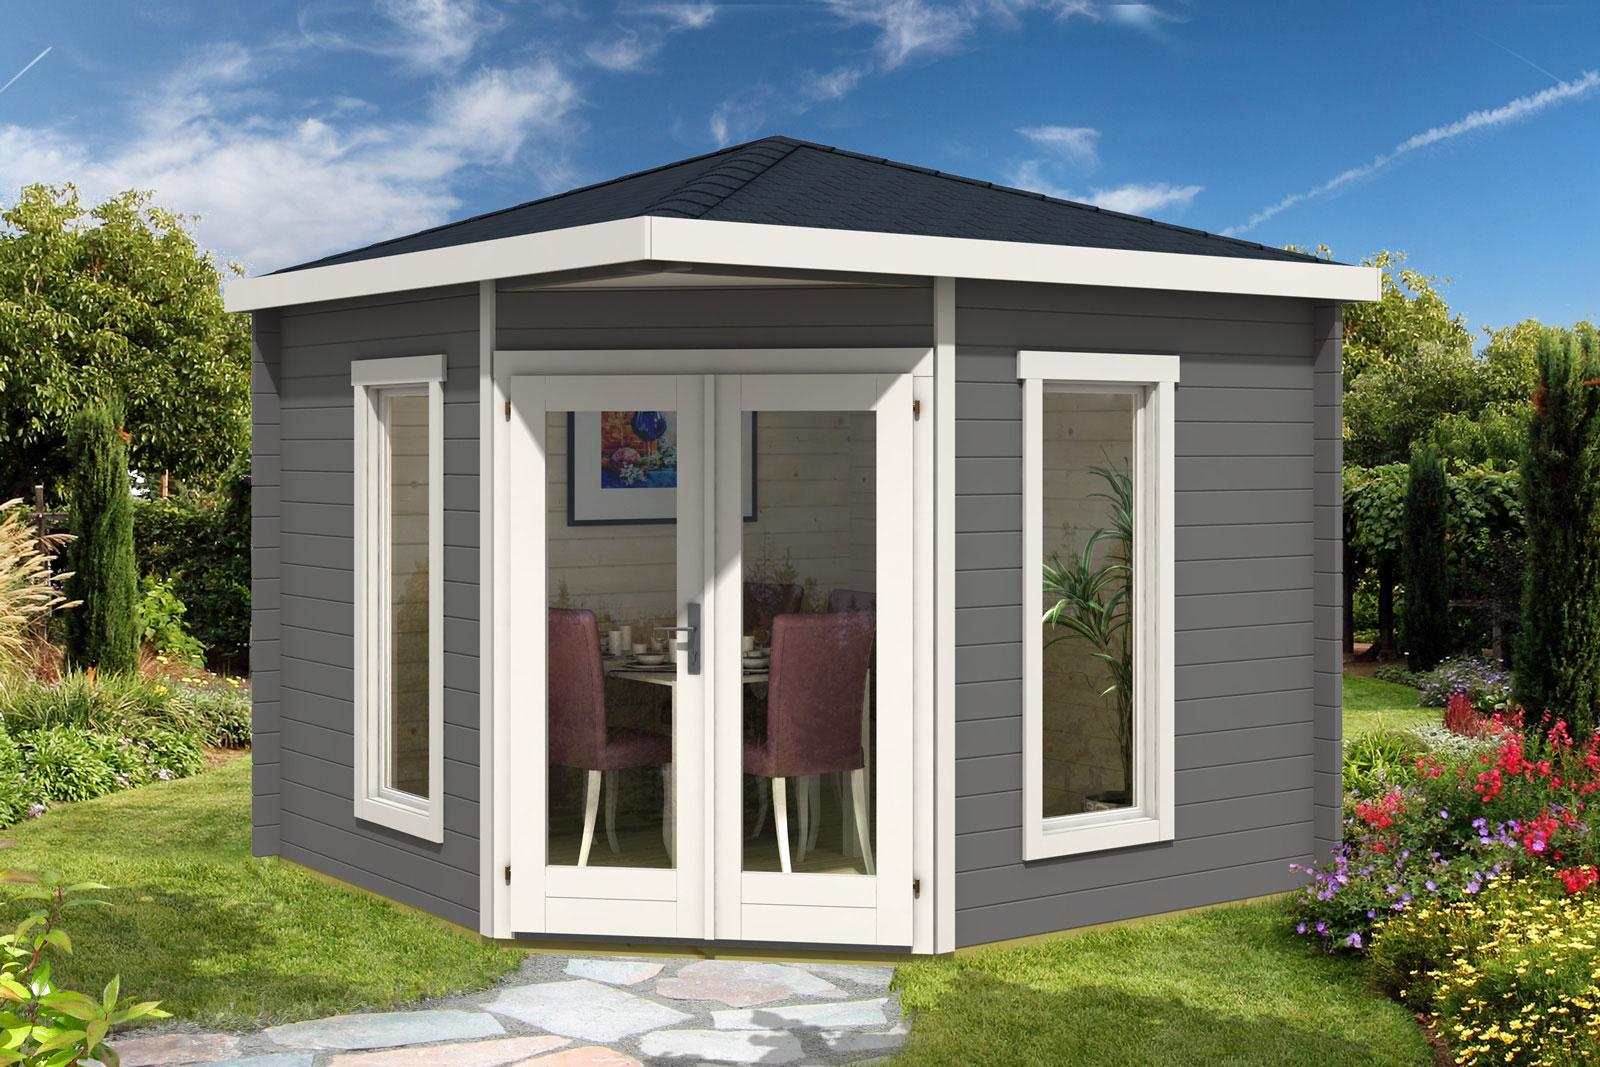 5 eck gartenhaus modell mika 40 a. Black Bedroom Furniture Sets. Home Design Ideas